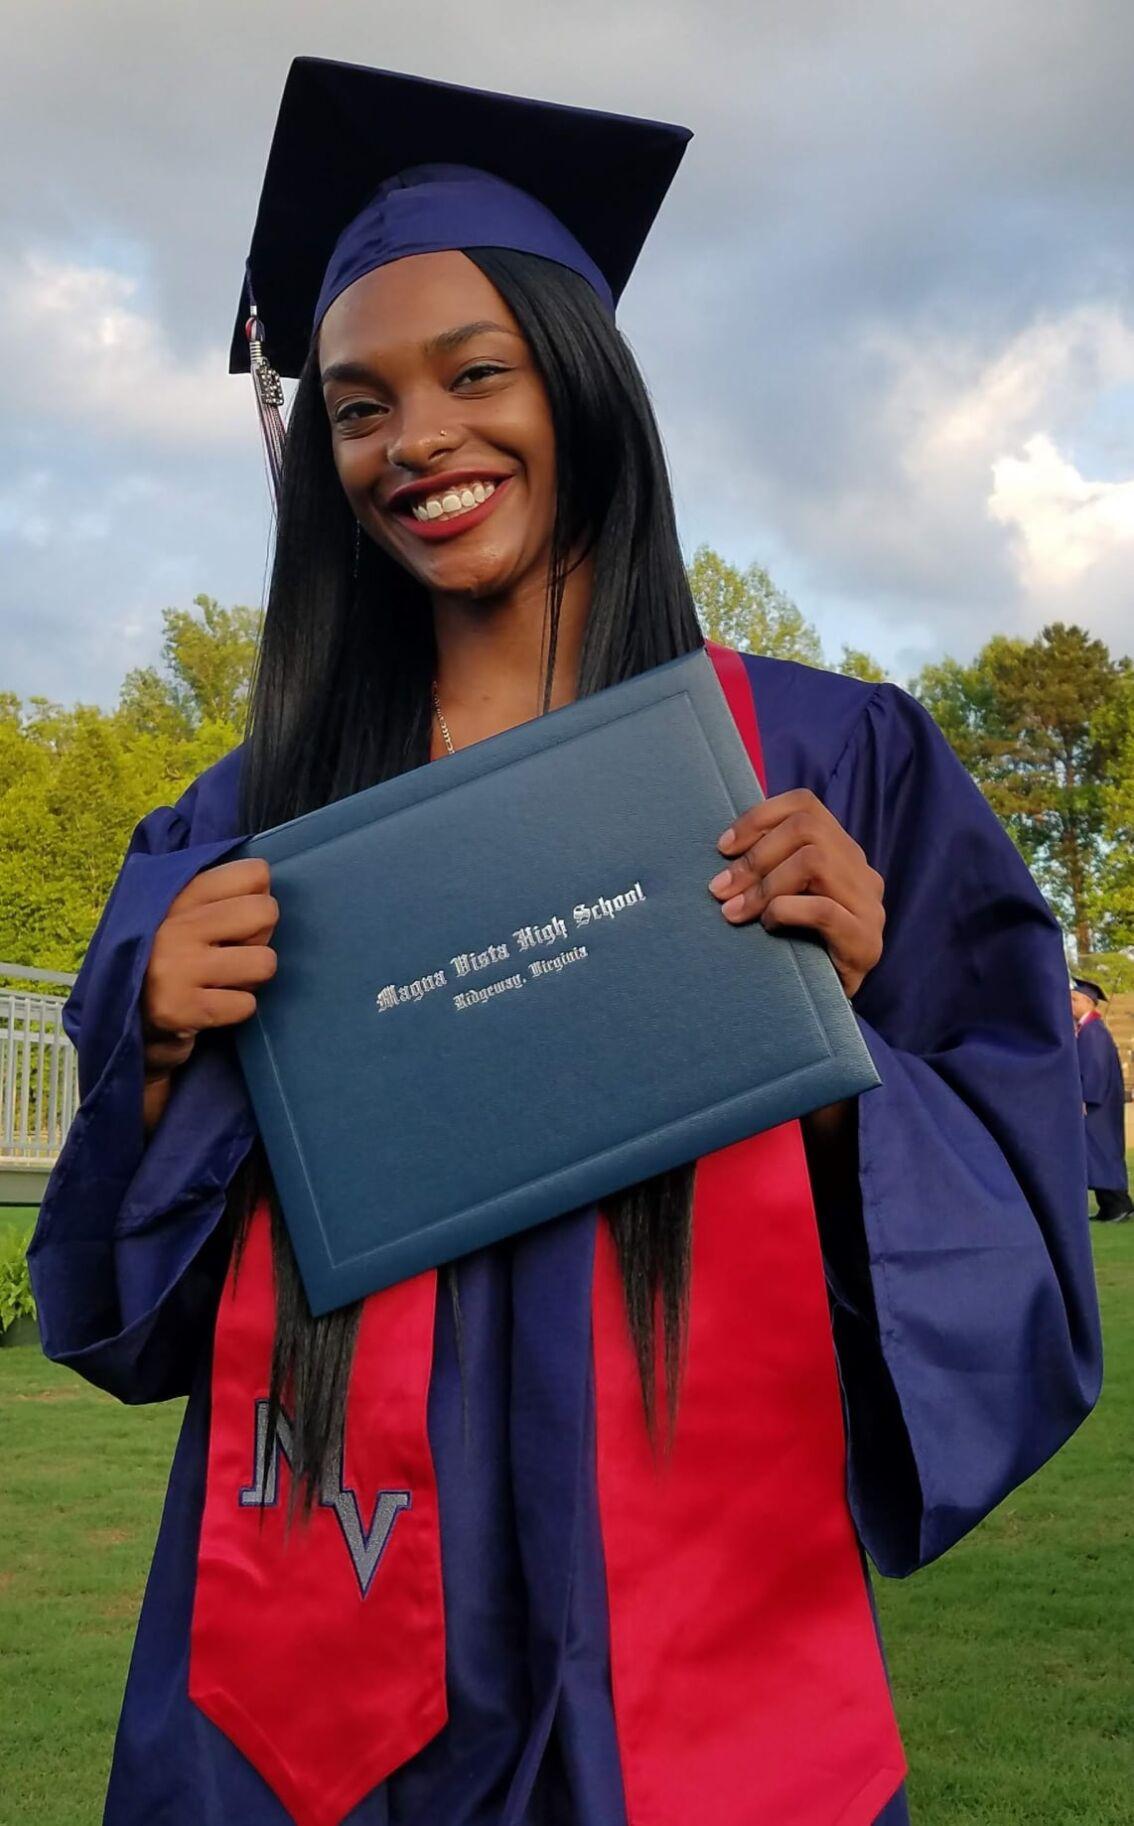 NJC graduation photo